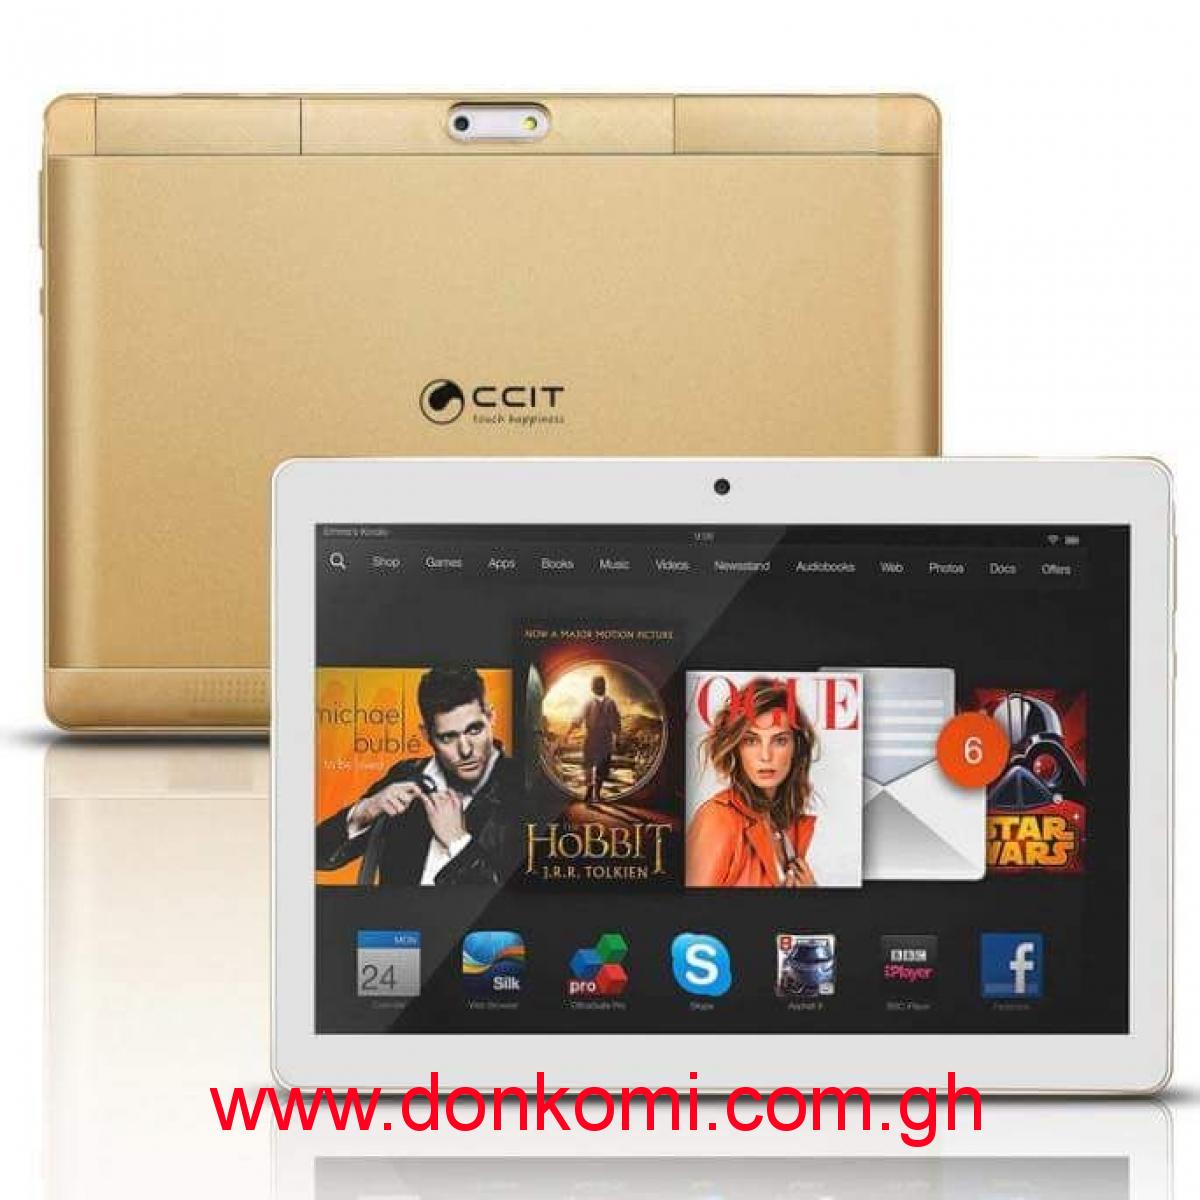 CCIT T9MARS Tablet